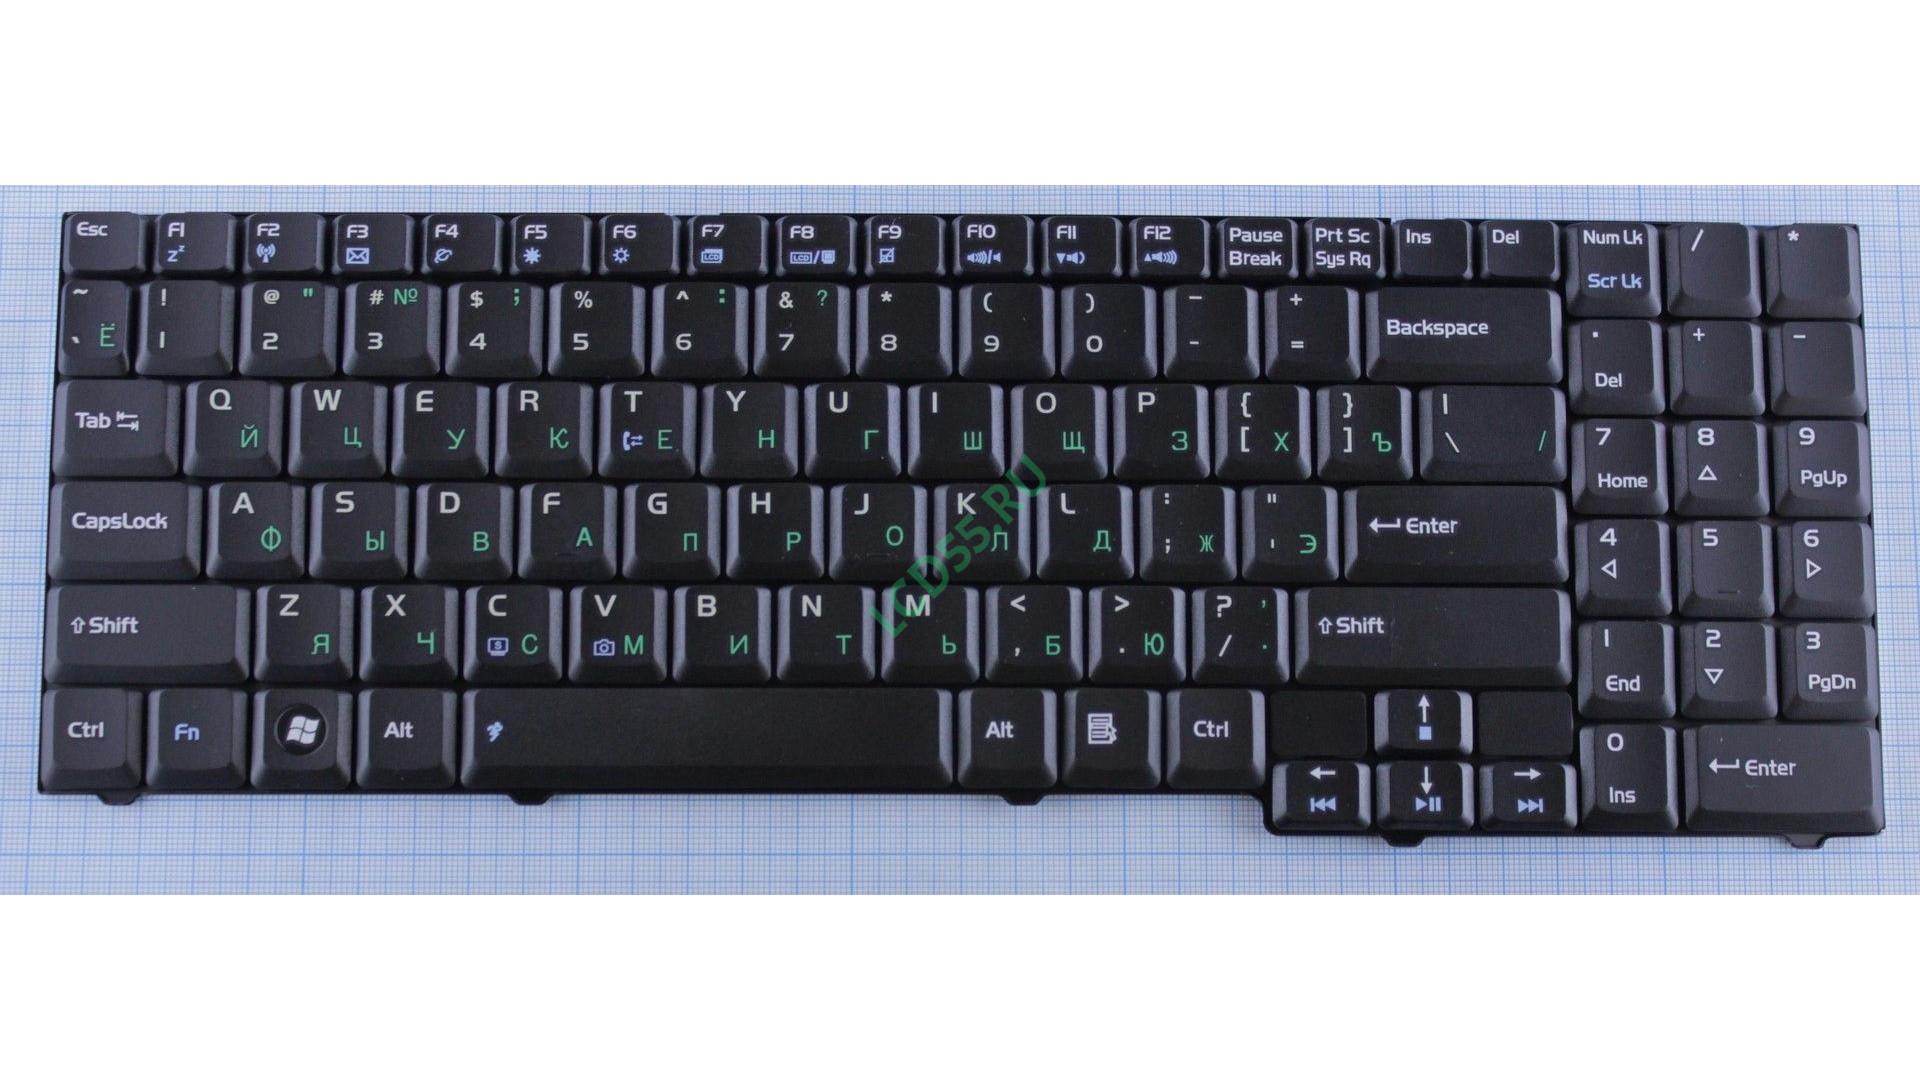 Клавиатура Asus M51, M51A, M51Ta, M51Tr, M51Vr, M51S, M51Se, F7, F7Sr, F7Se, F7Kr, F7L, F7Z, X56, Pro57T